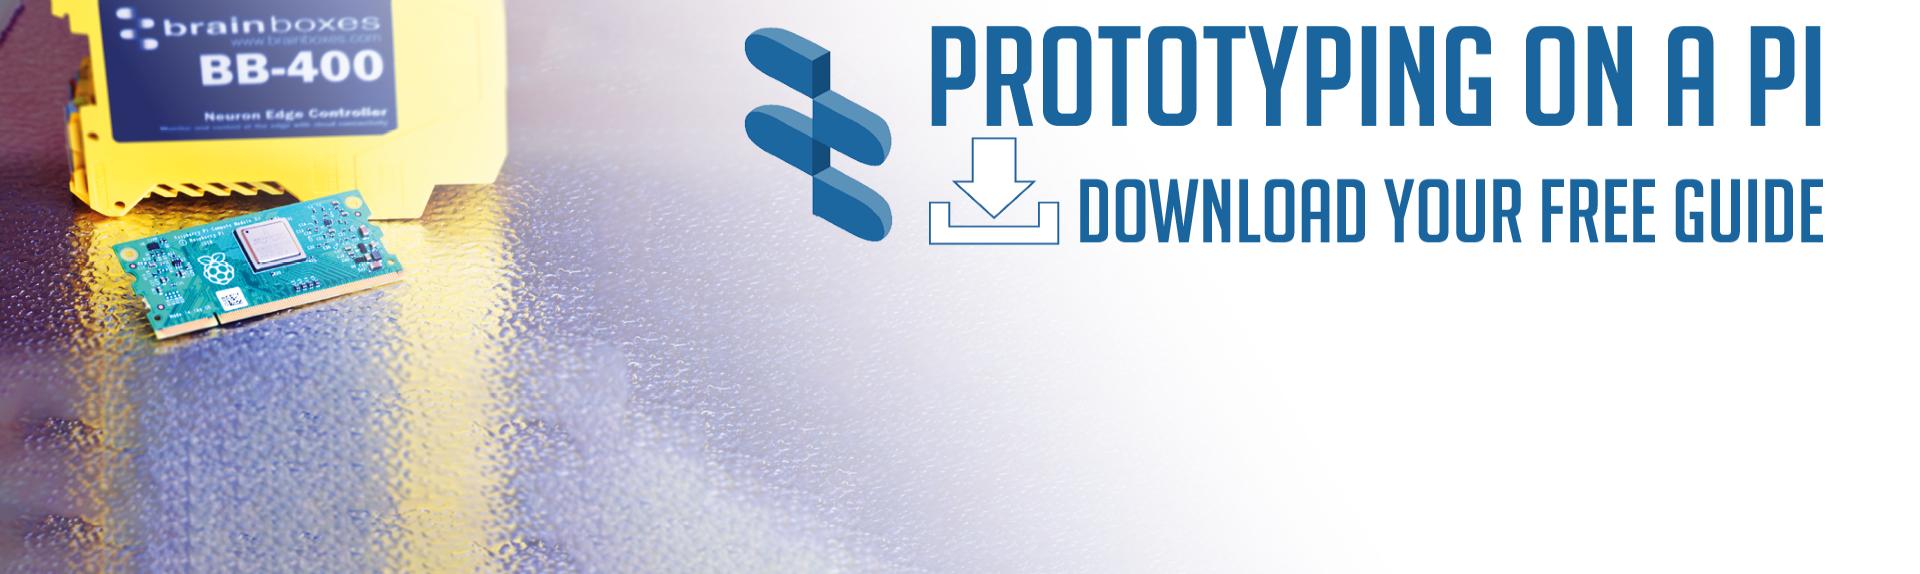 Brainboxes free prototyping on raspberry pi ebook